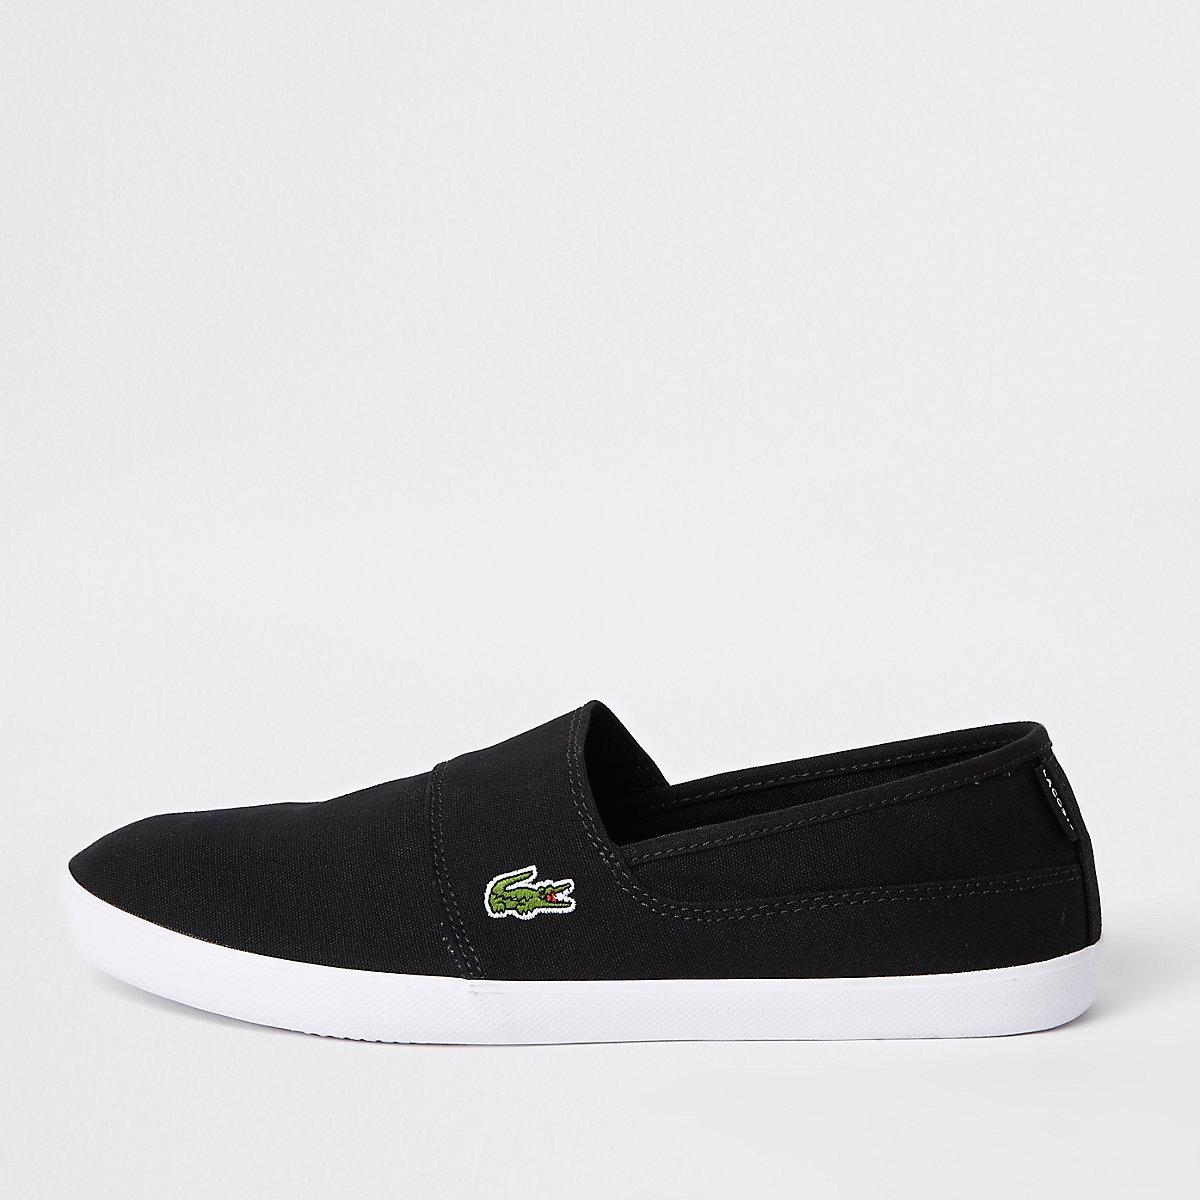 Lacoste black slip on sneakers